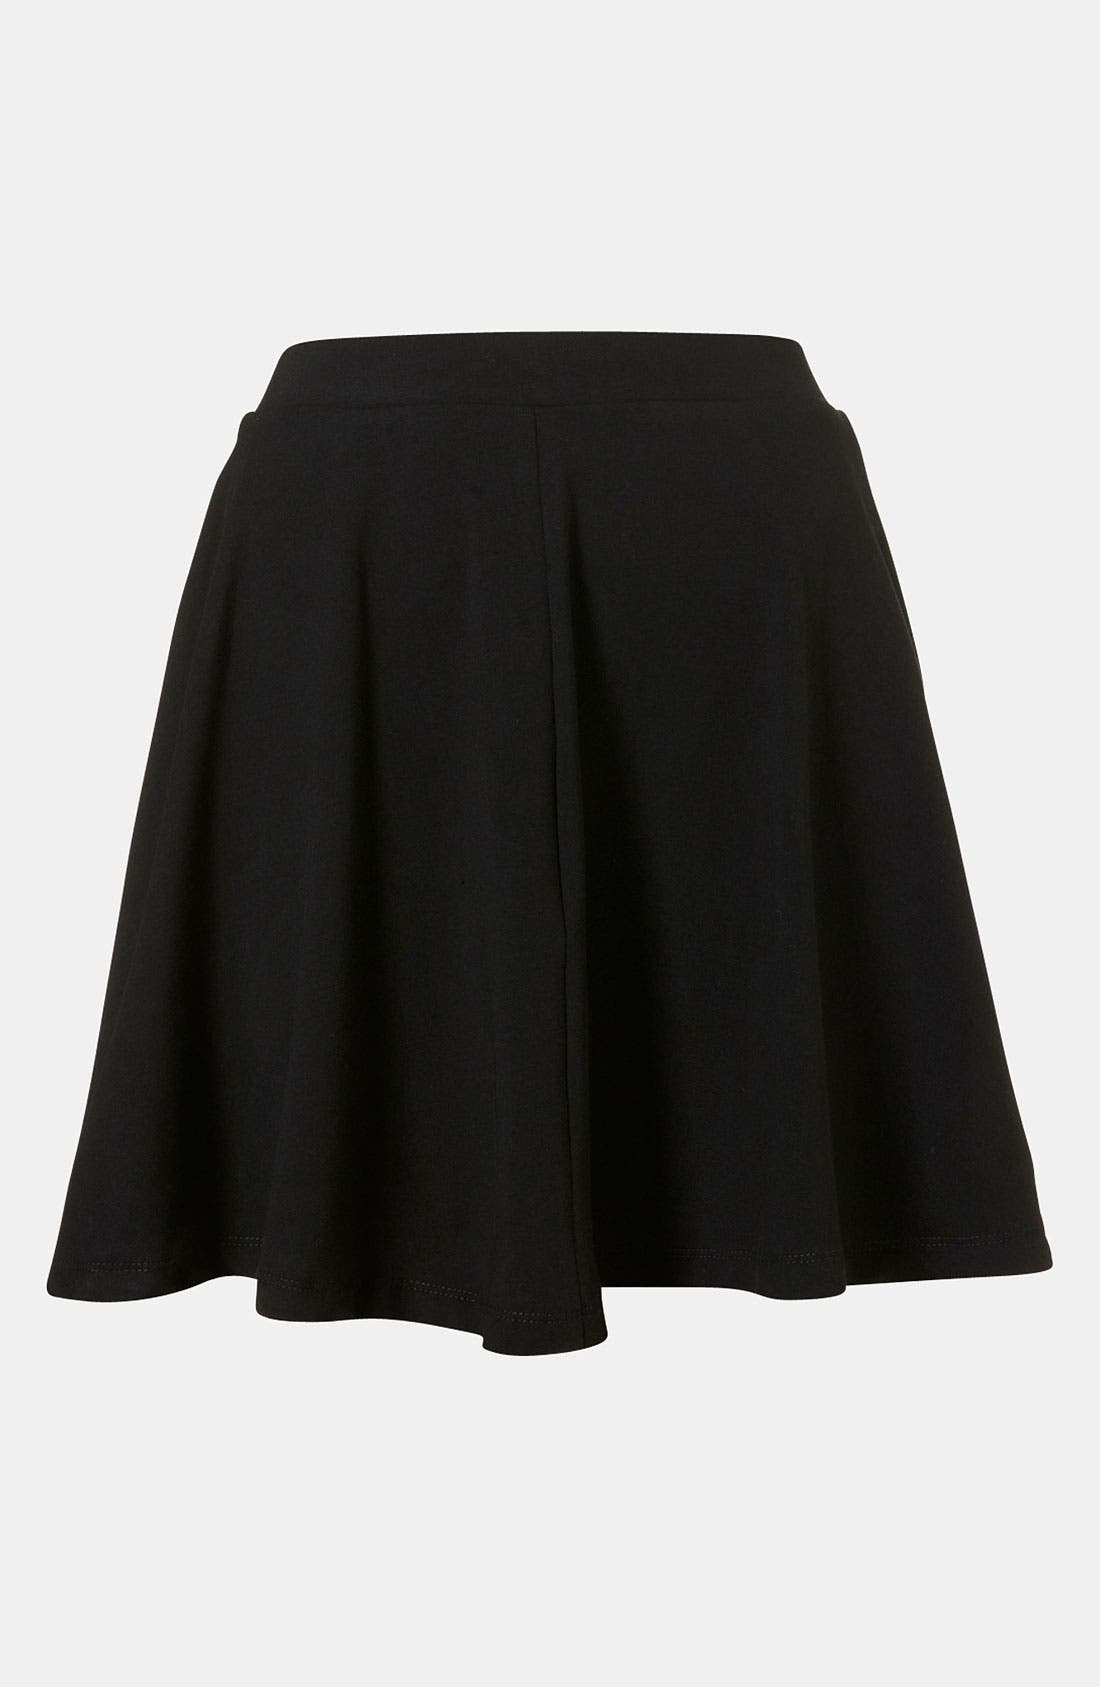 Main Image - Topshop 'Andie' Skater Skirt